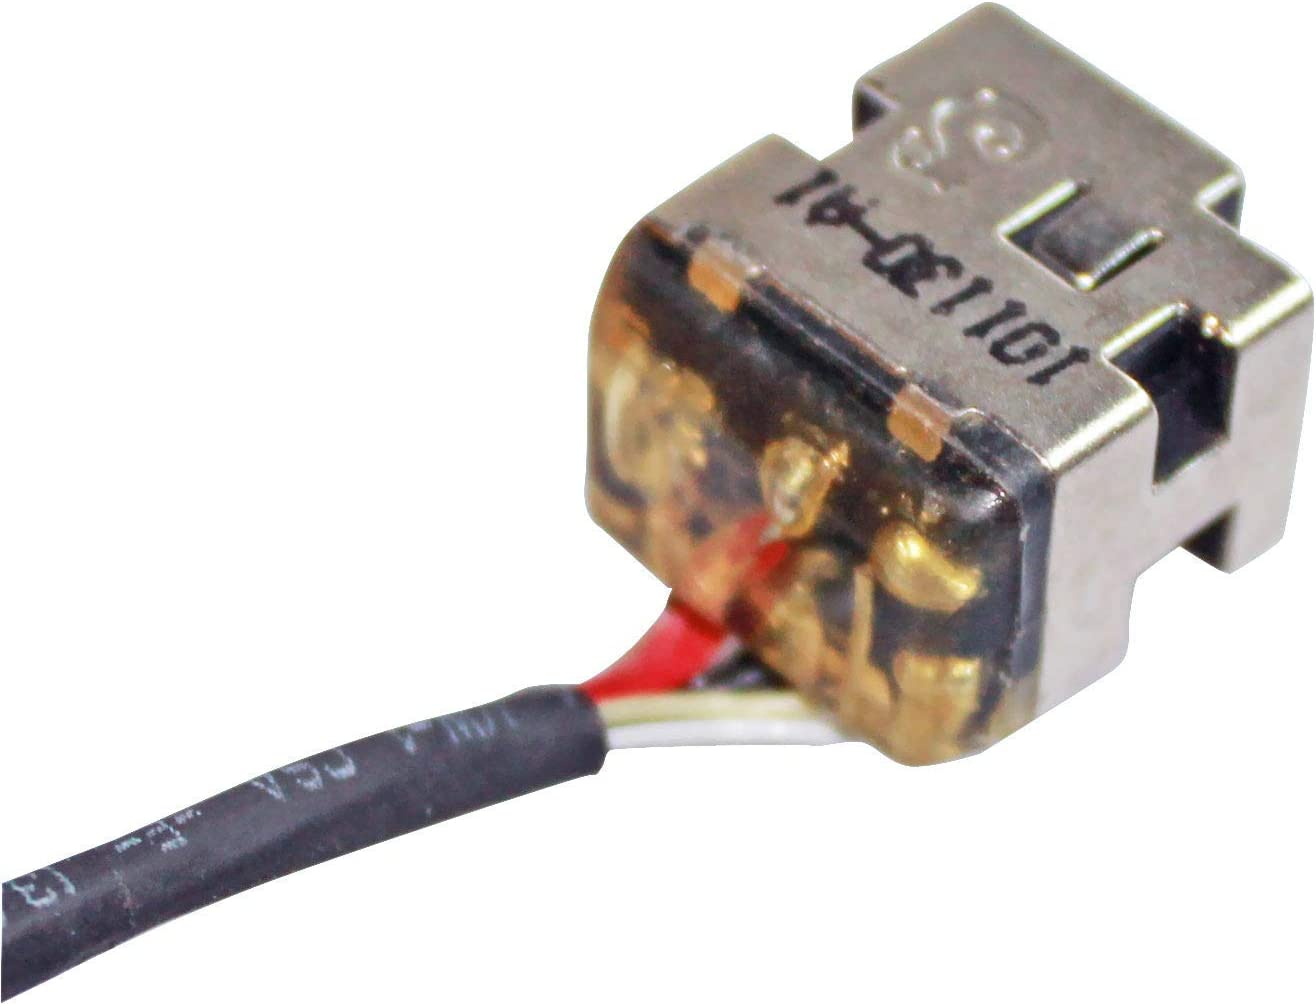 GinTai DC Power Jack with Cable Socket Plug Replacement for HP Pavilion dv6z-3200 CTO dv6-3201tx dv6-3263cl dv6-3264ca dv6-3267cl dv6-3210us dv6-3212nr dv6-3216us 30pcs